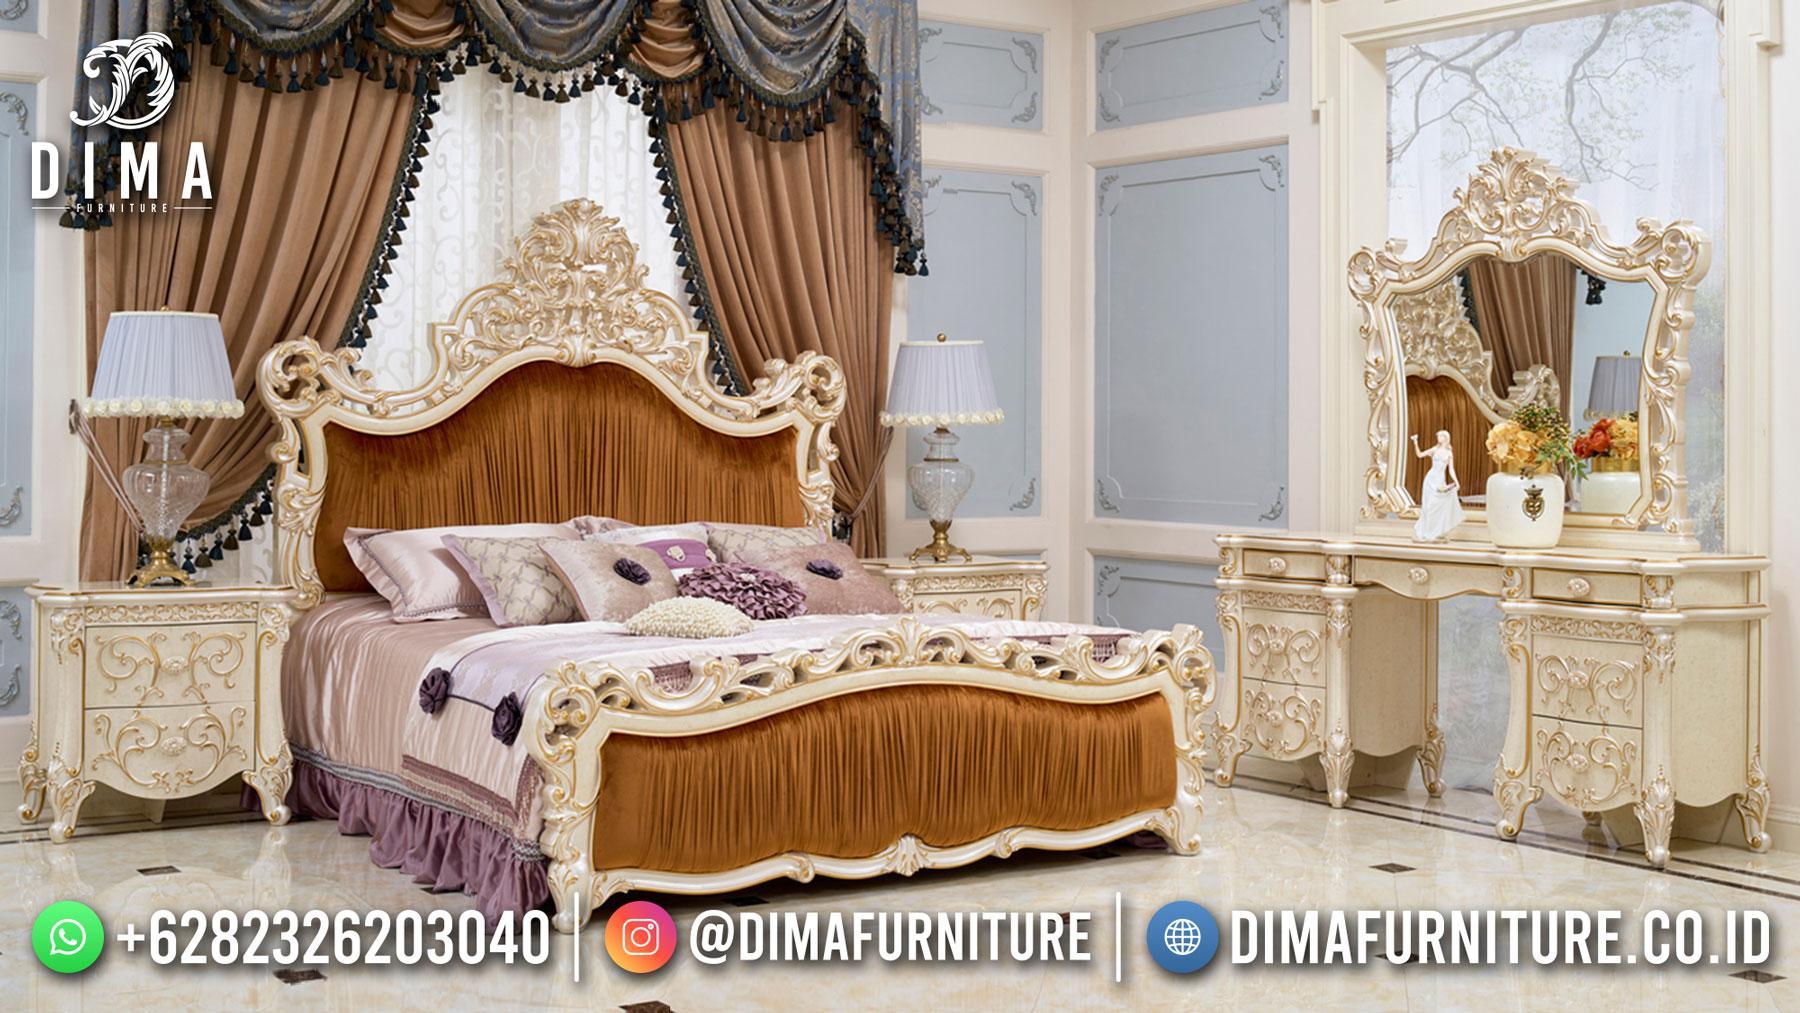 Kamar Set Mewah Ukiran Jepara New Released Luxury Design ST-1408